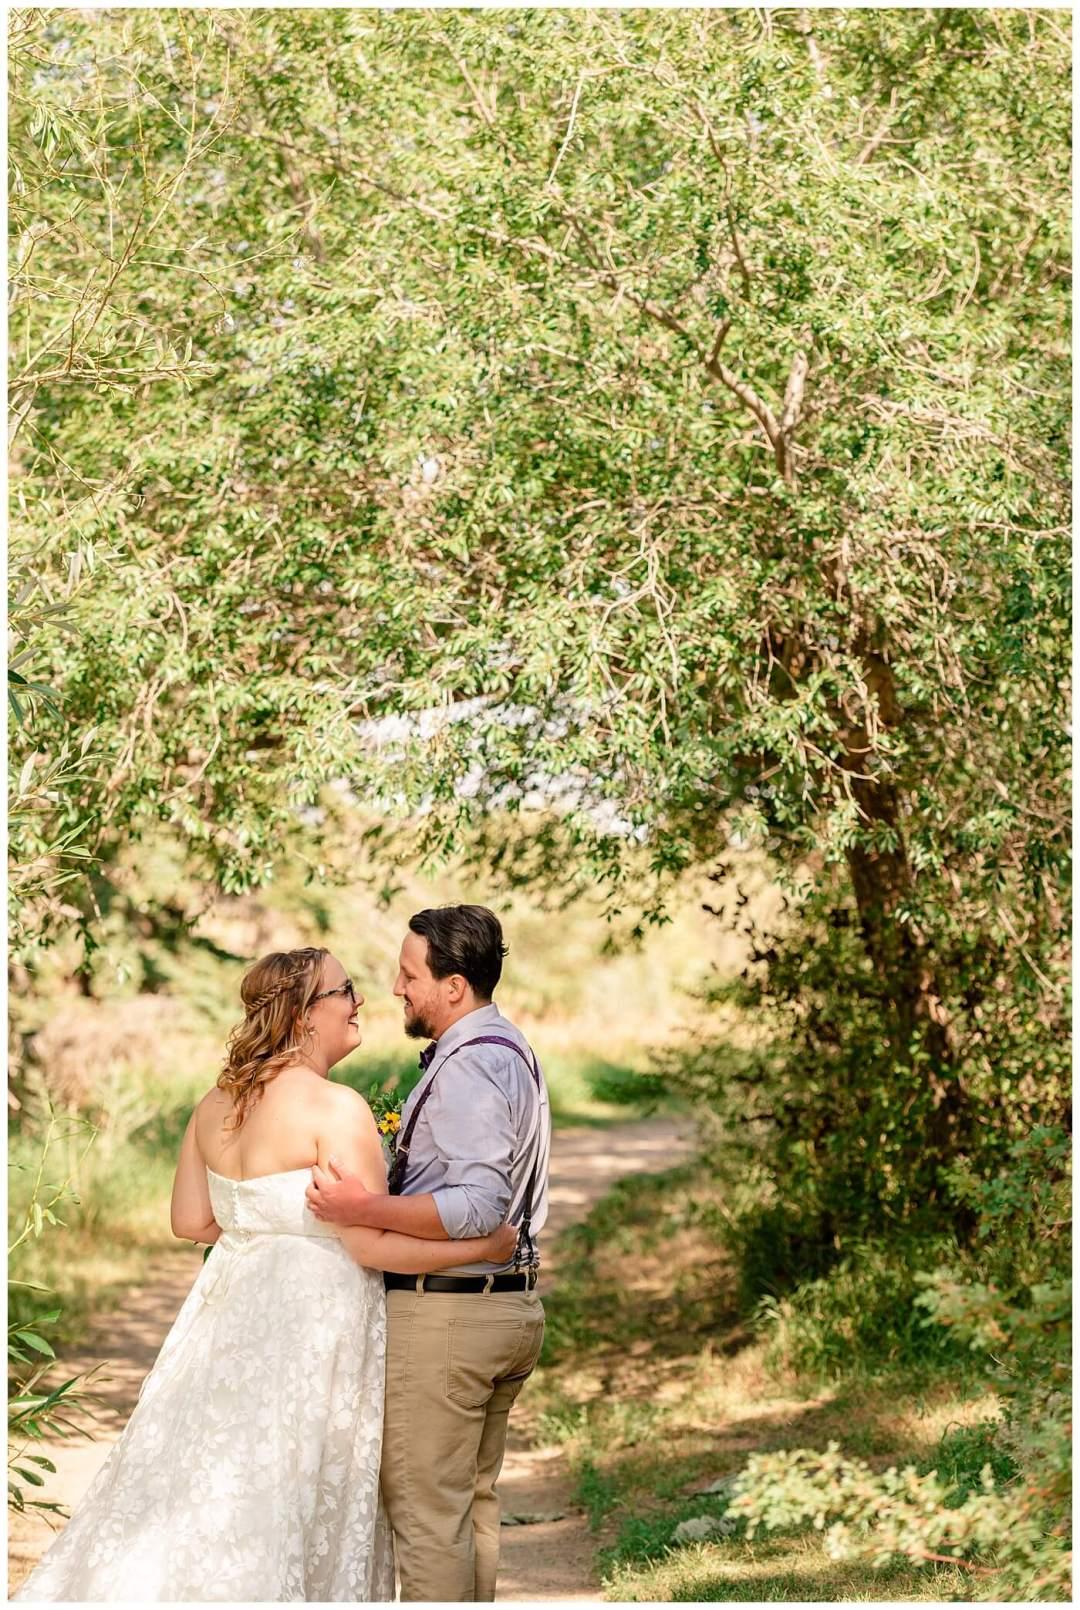 Regina Wedding Photography - Ryan - Aeliesha - Bride & Groom stand under an archway of trees on the island in AE Wilson Park.jpg